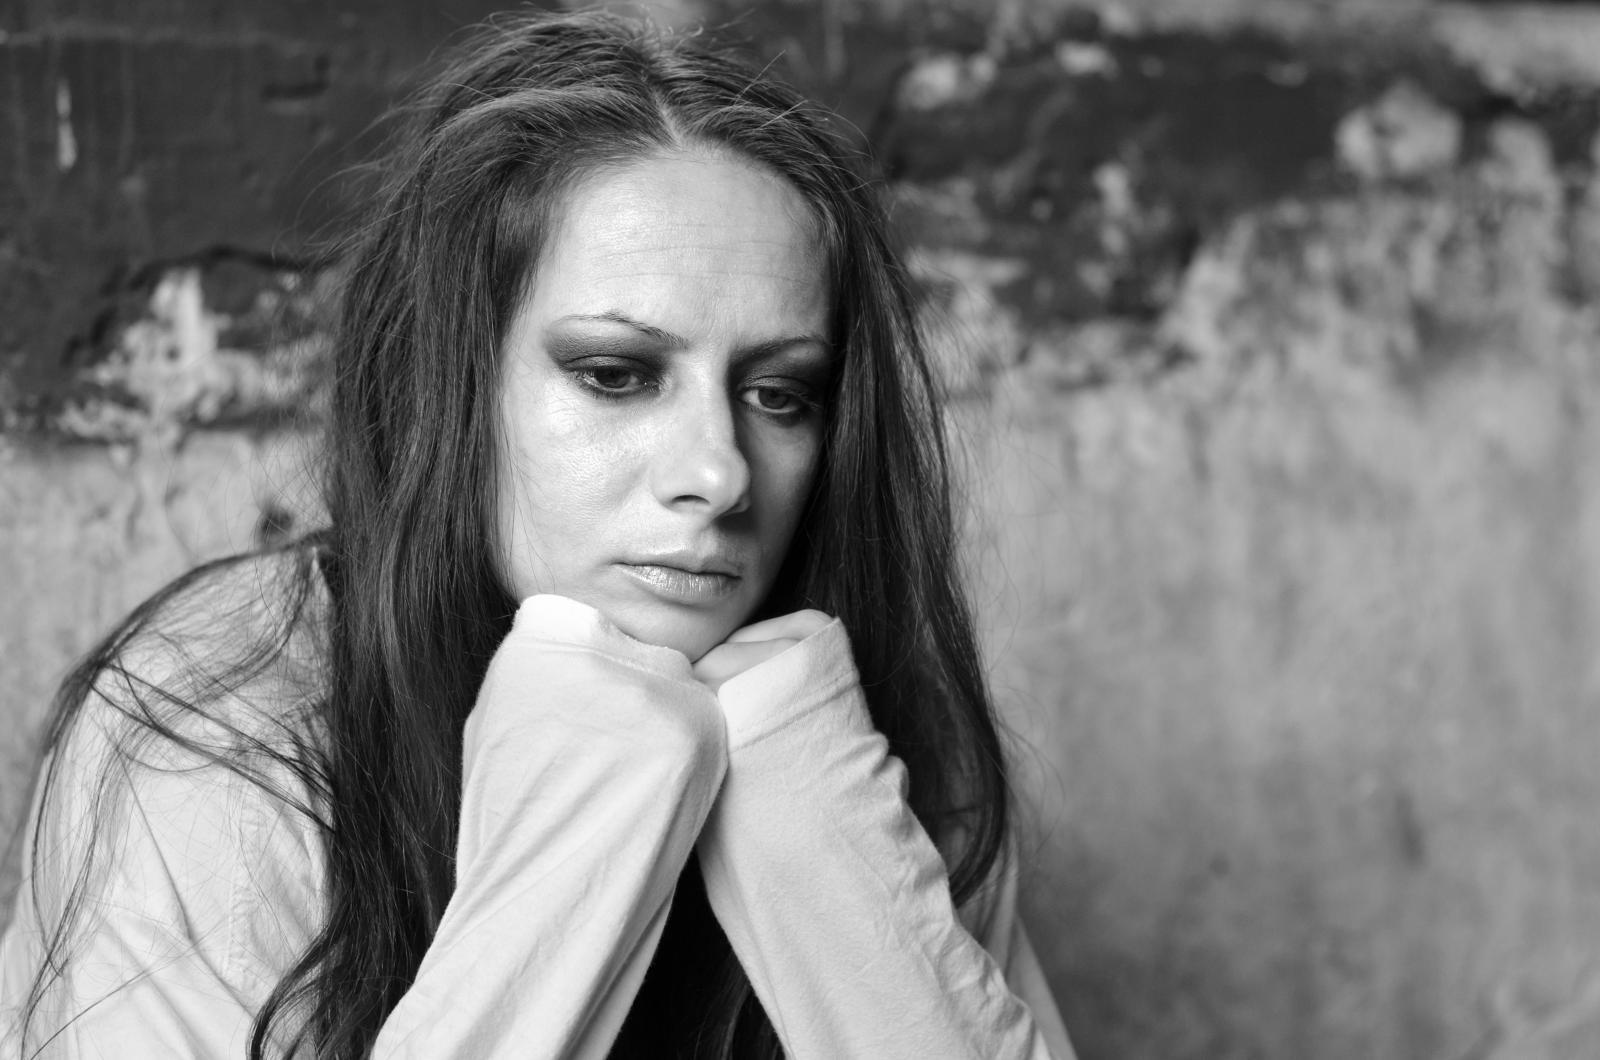 Aider les femmes usagères de drogues